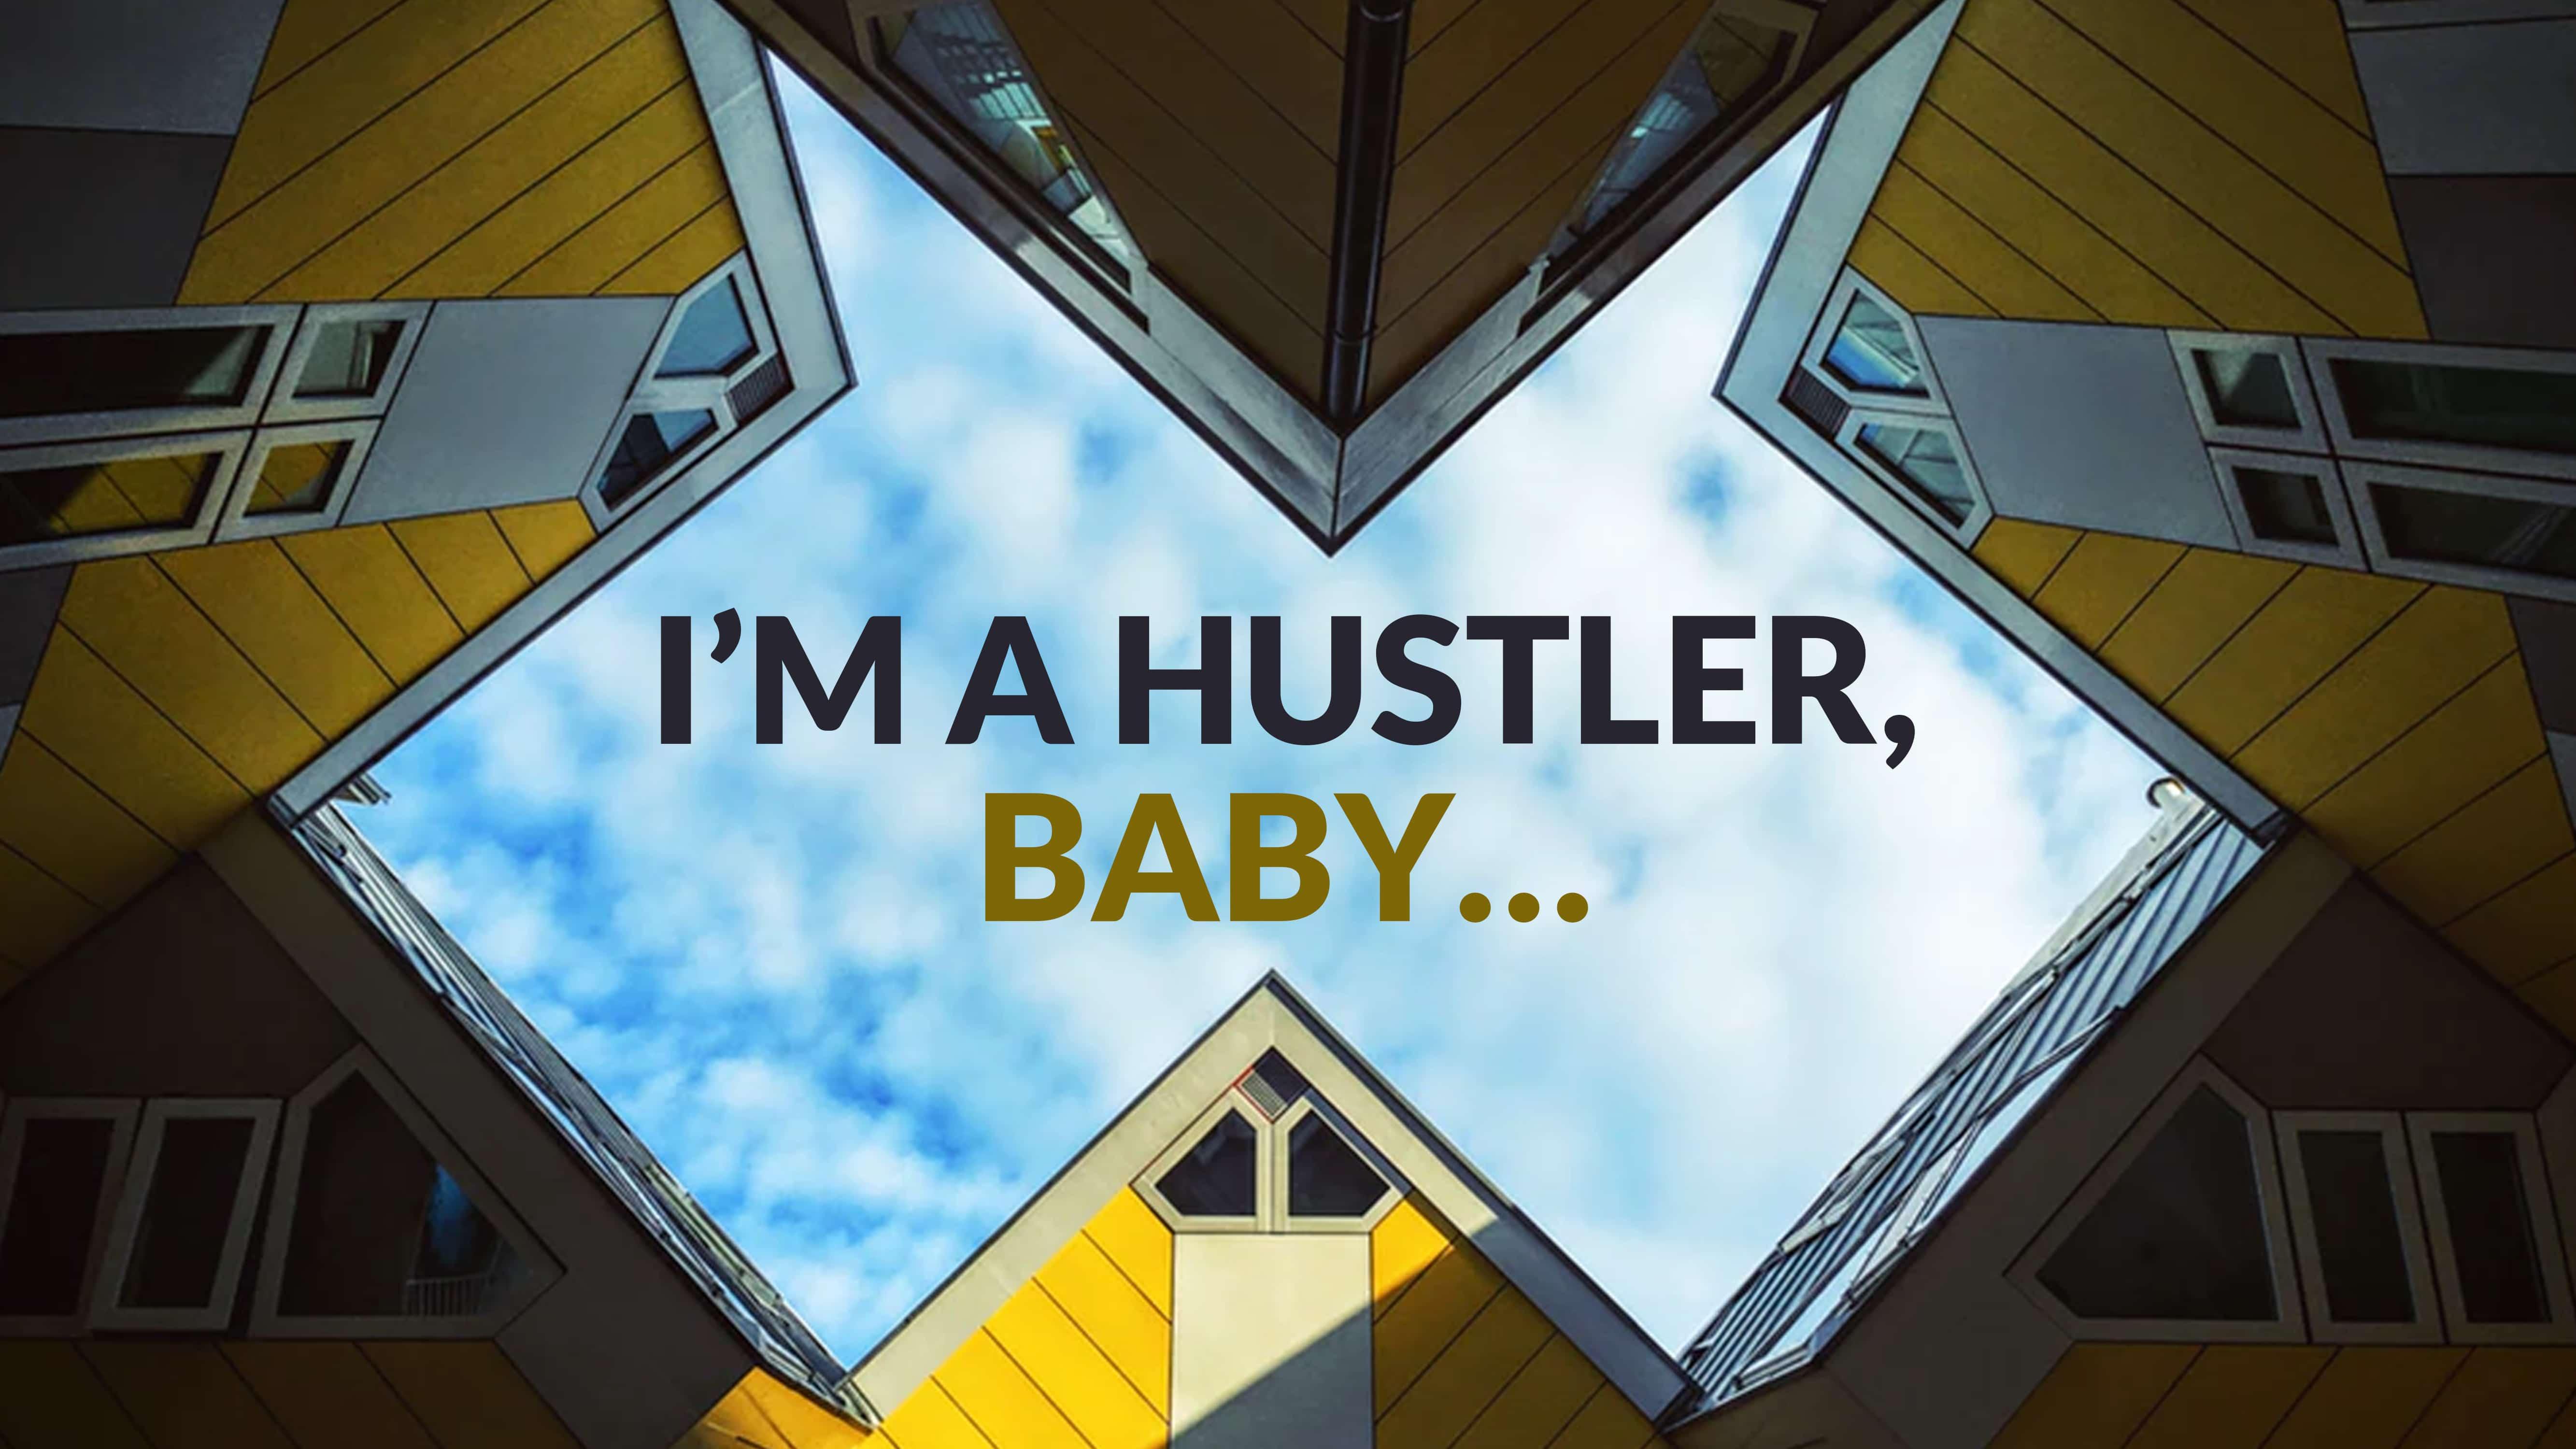 I'm a hustler, baby…